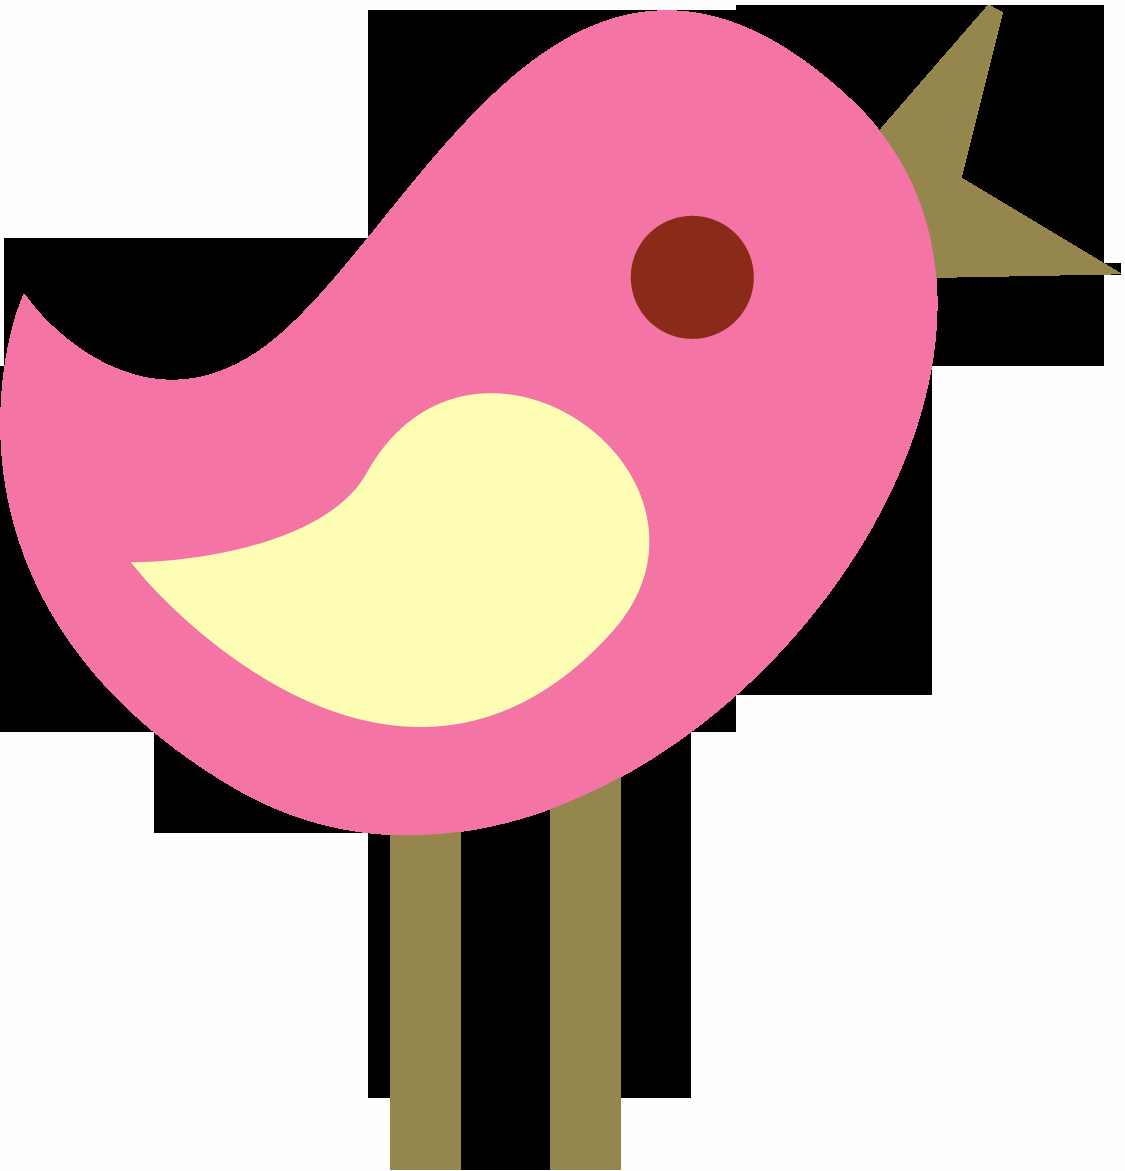 1125x1171 Bird House Clip Art Images Elegant Cute Birdhouse Clipart